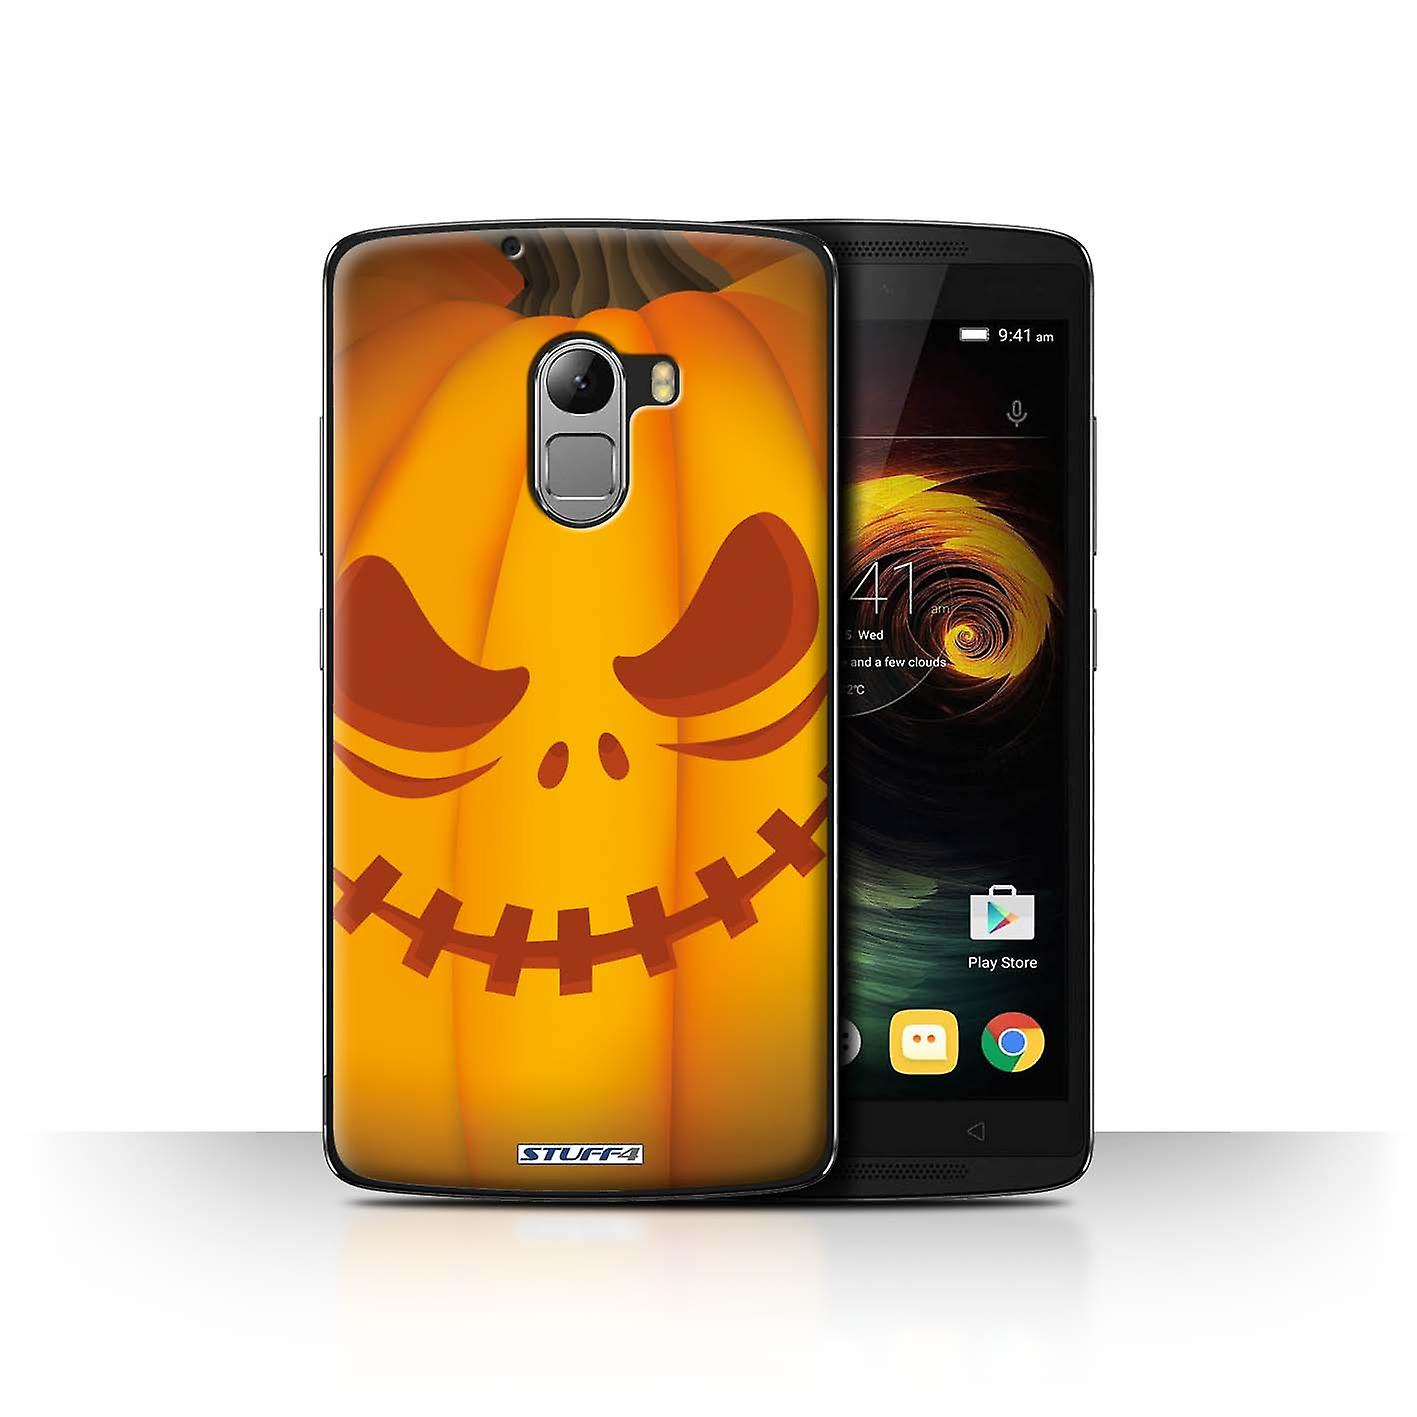 Halloween Klamotten Frisch Stuff4 Case Cover for Lenovo Vibe K4 Note Scary Halloween Pumpkin